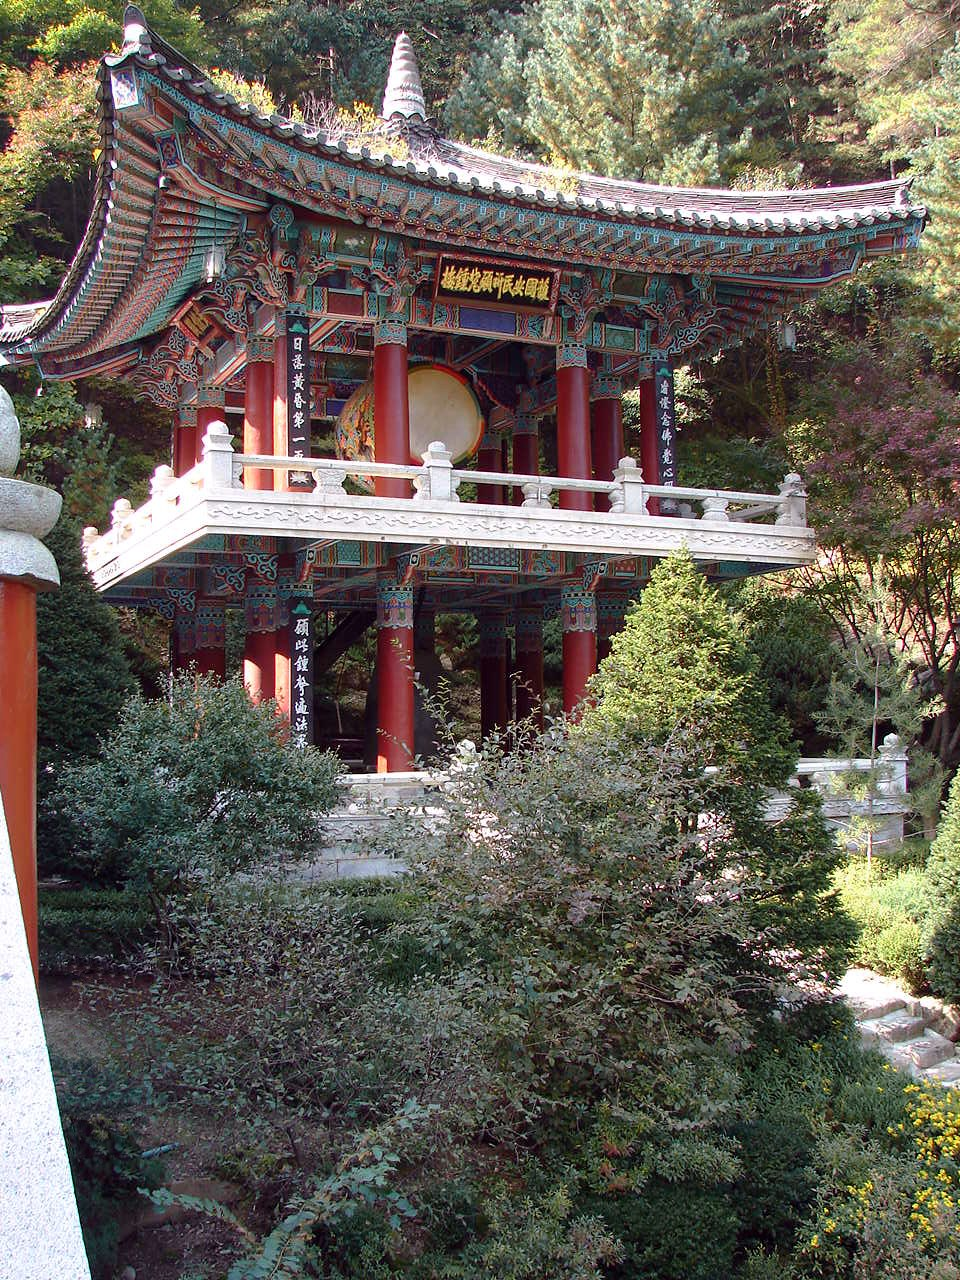 Korea-Danyang-Guinsa Bell Pavilion 2949-07